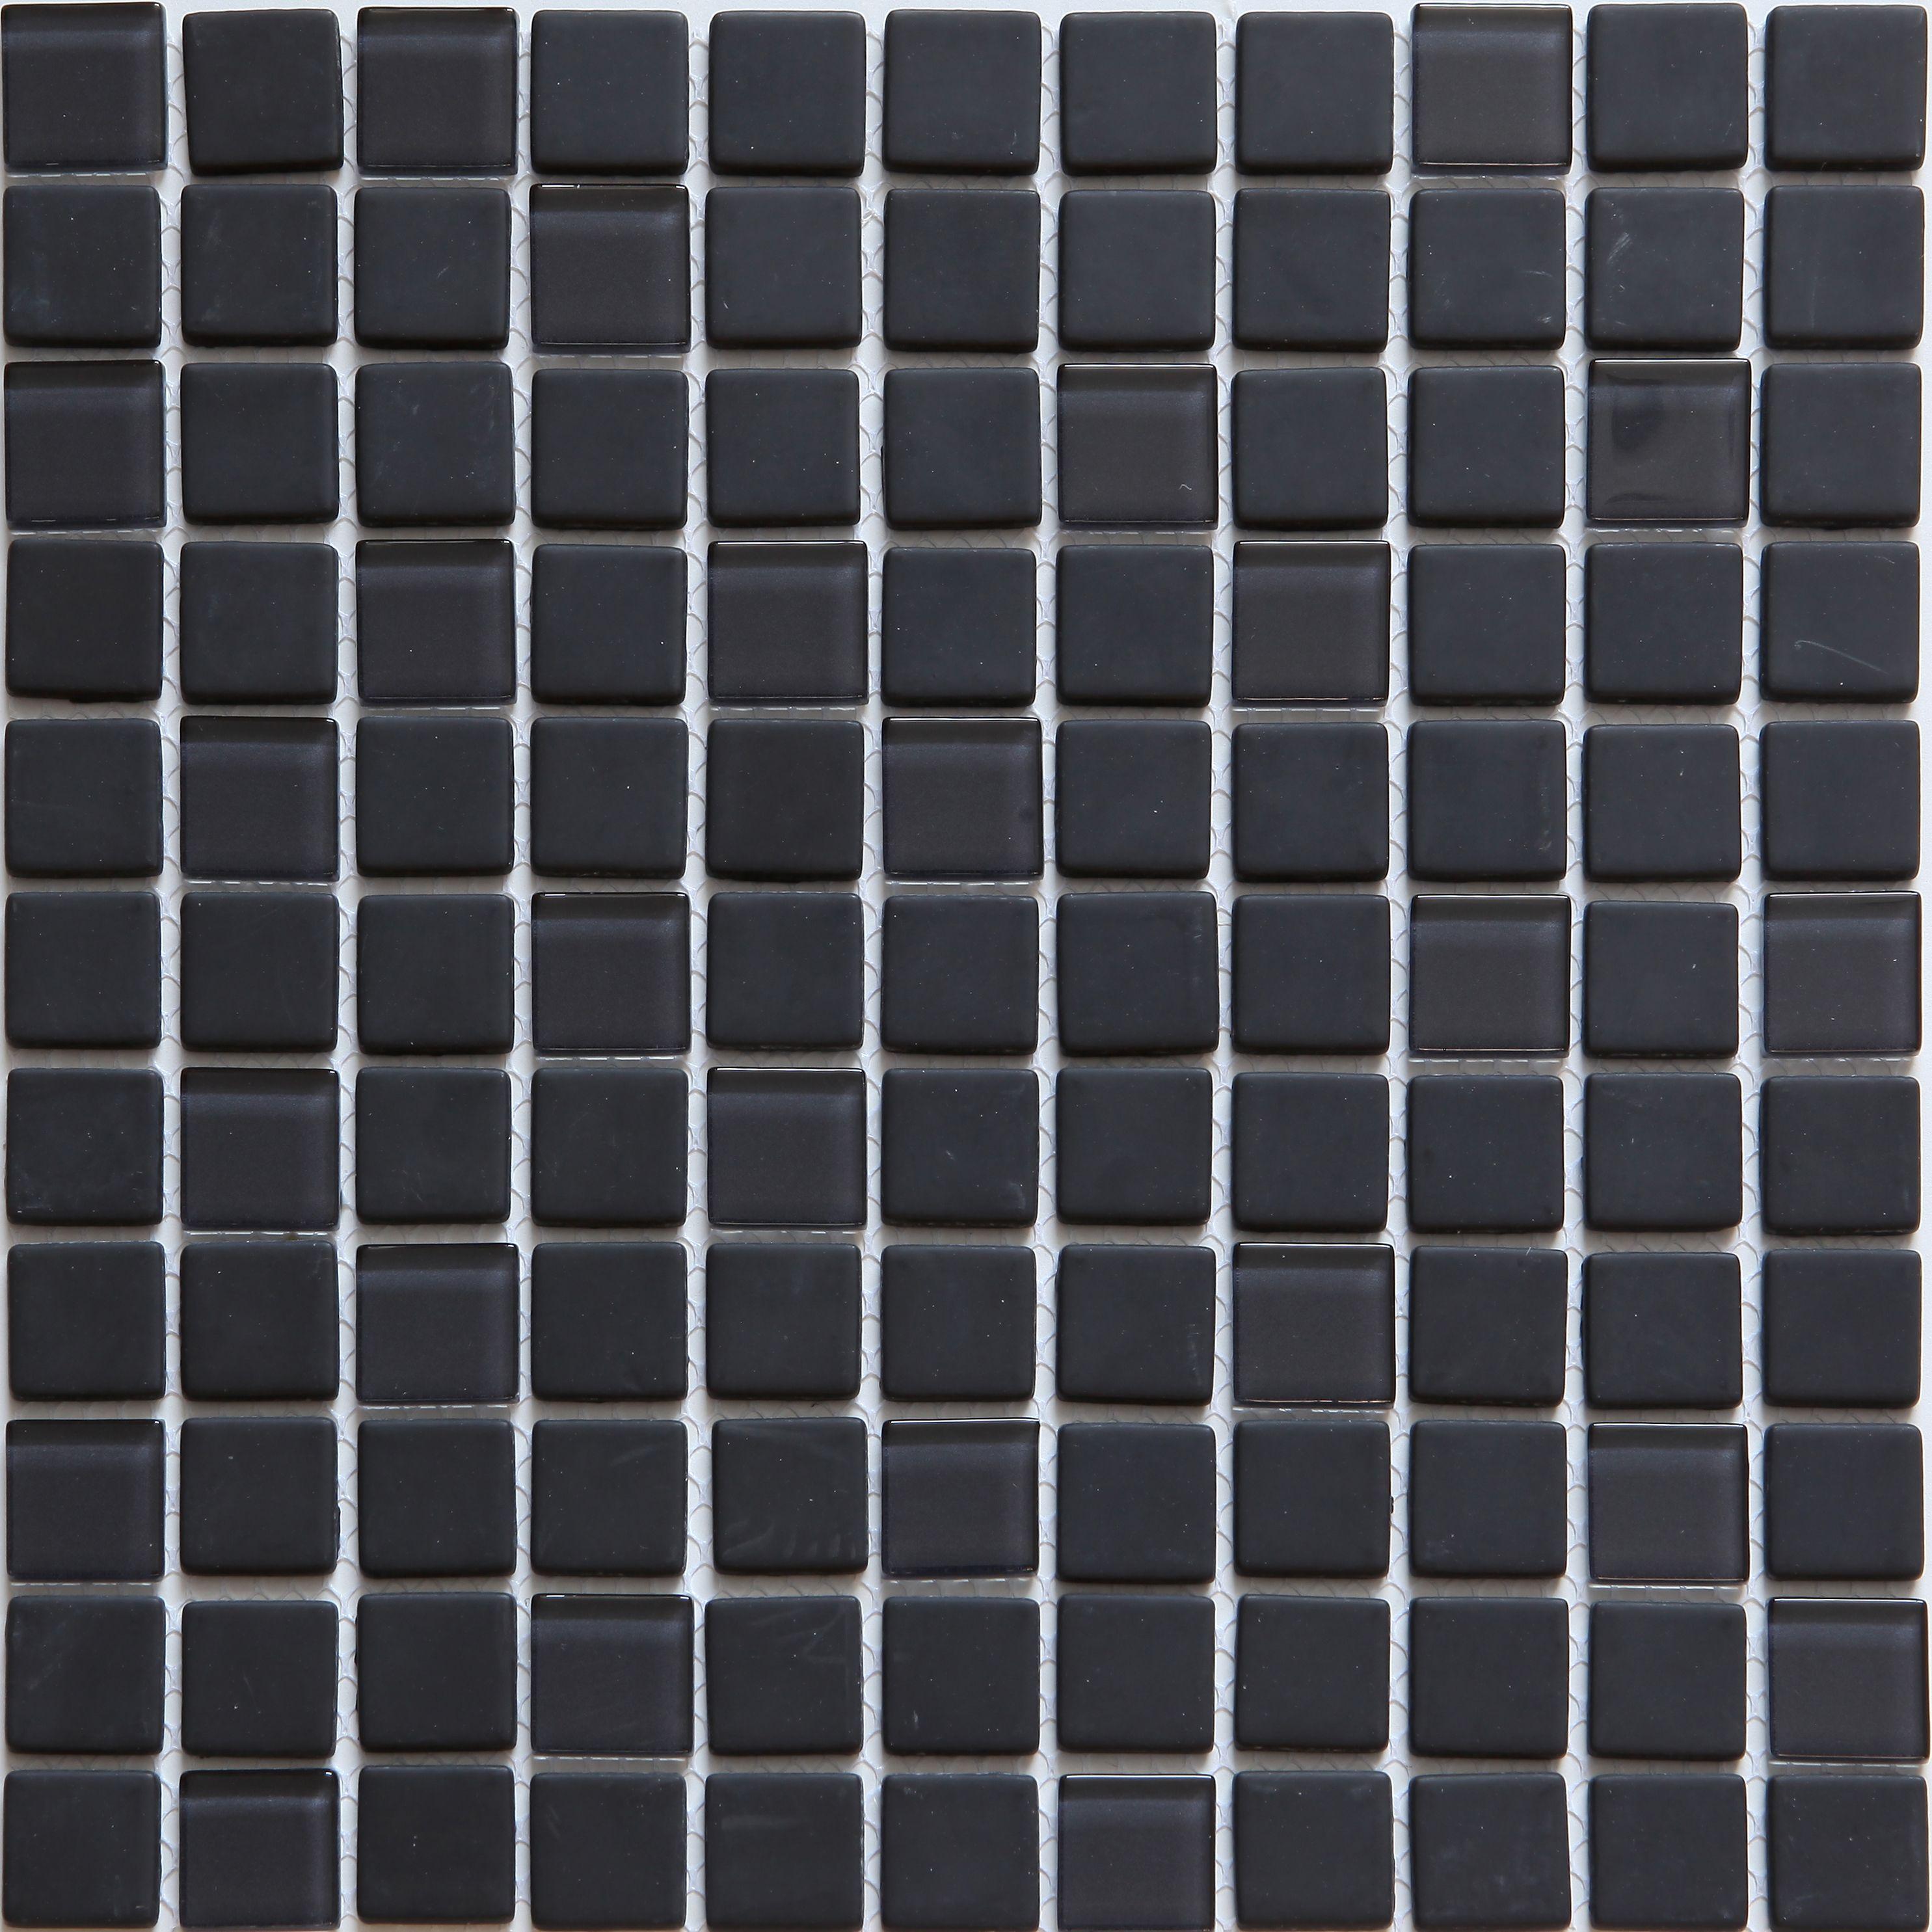 Genovia Black Grey Glass Mosaic Tile L 300mm W 300mm Departments Diy At B Q